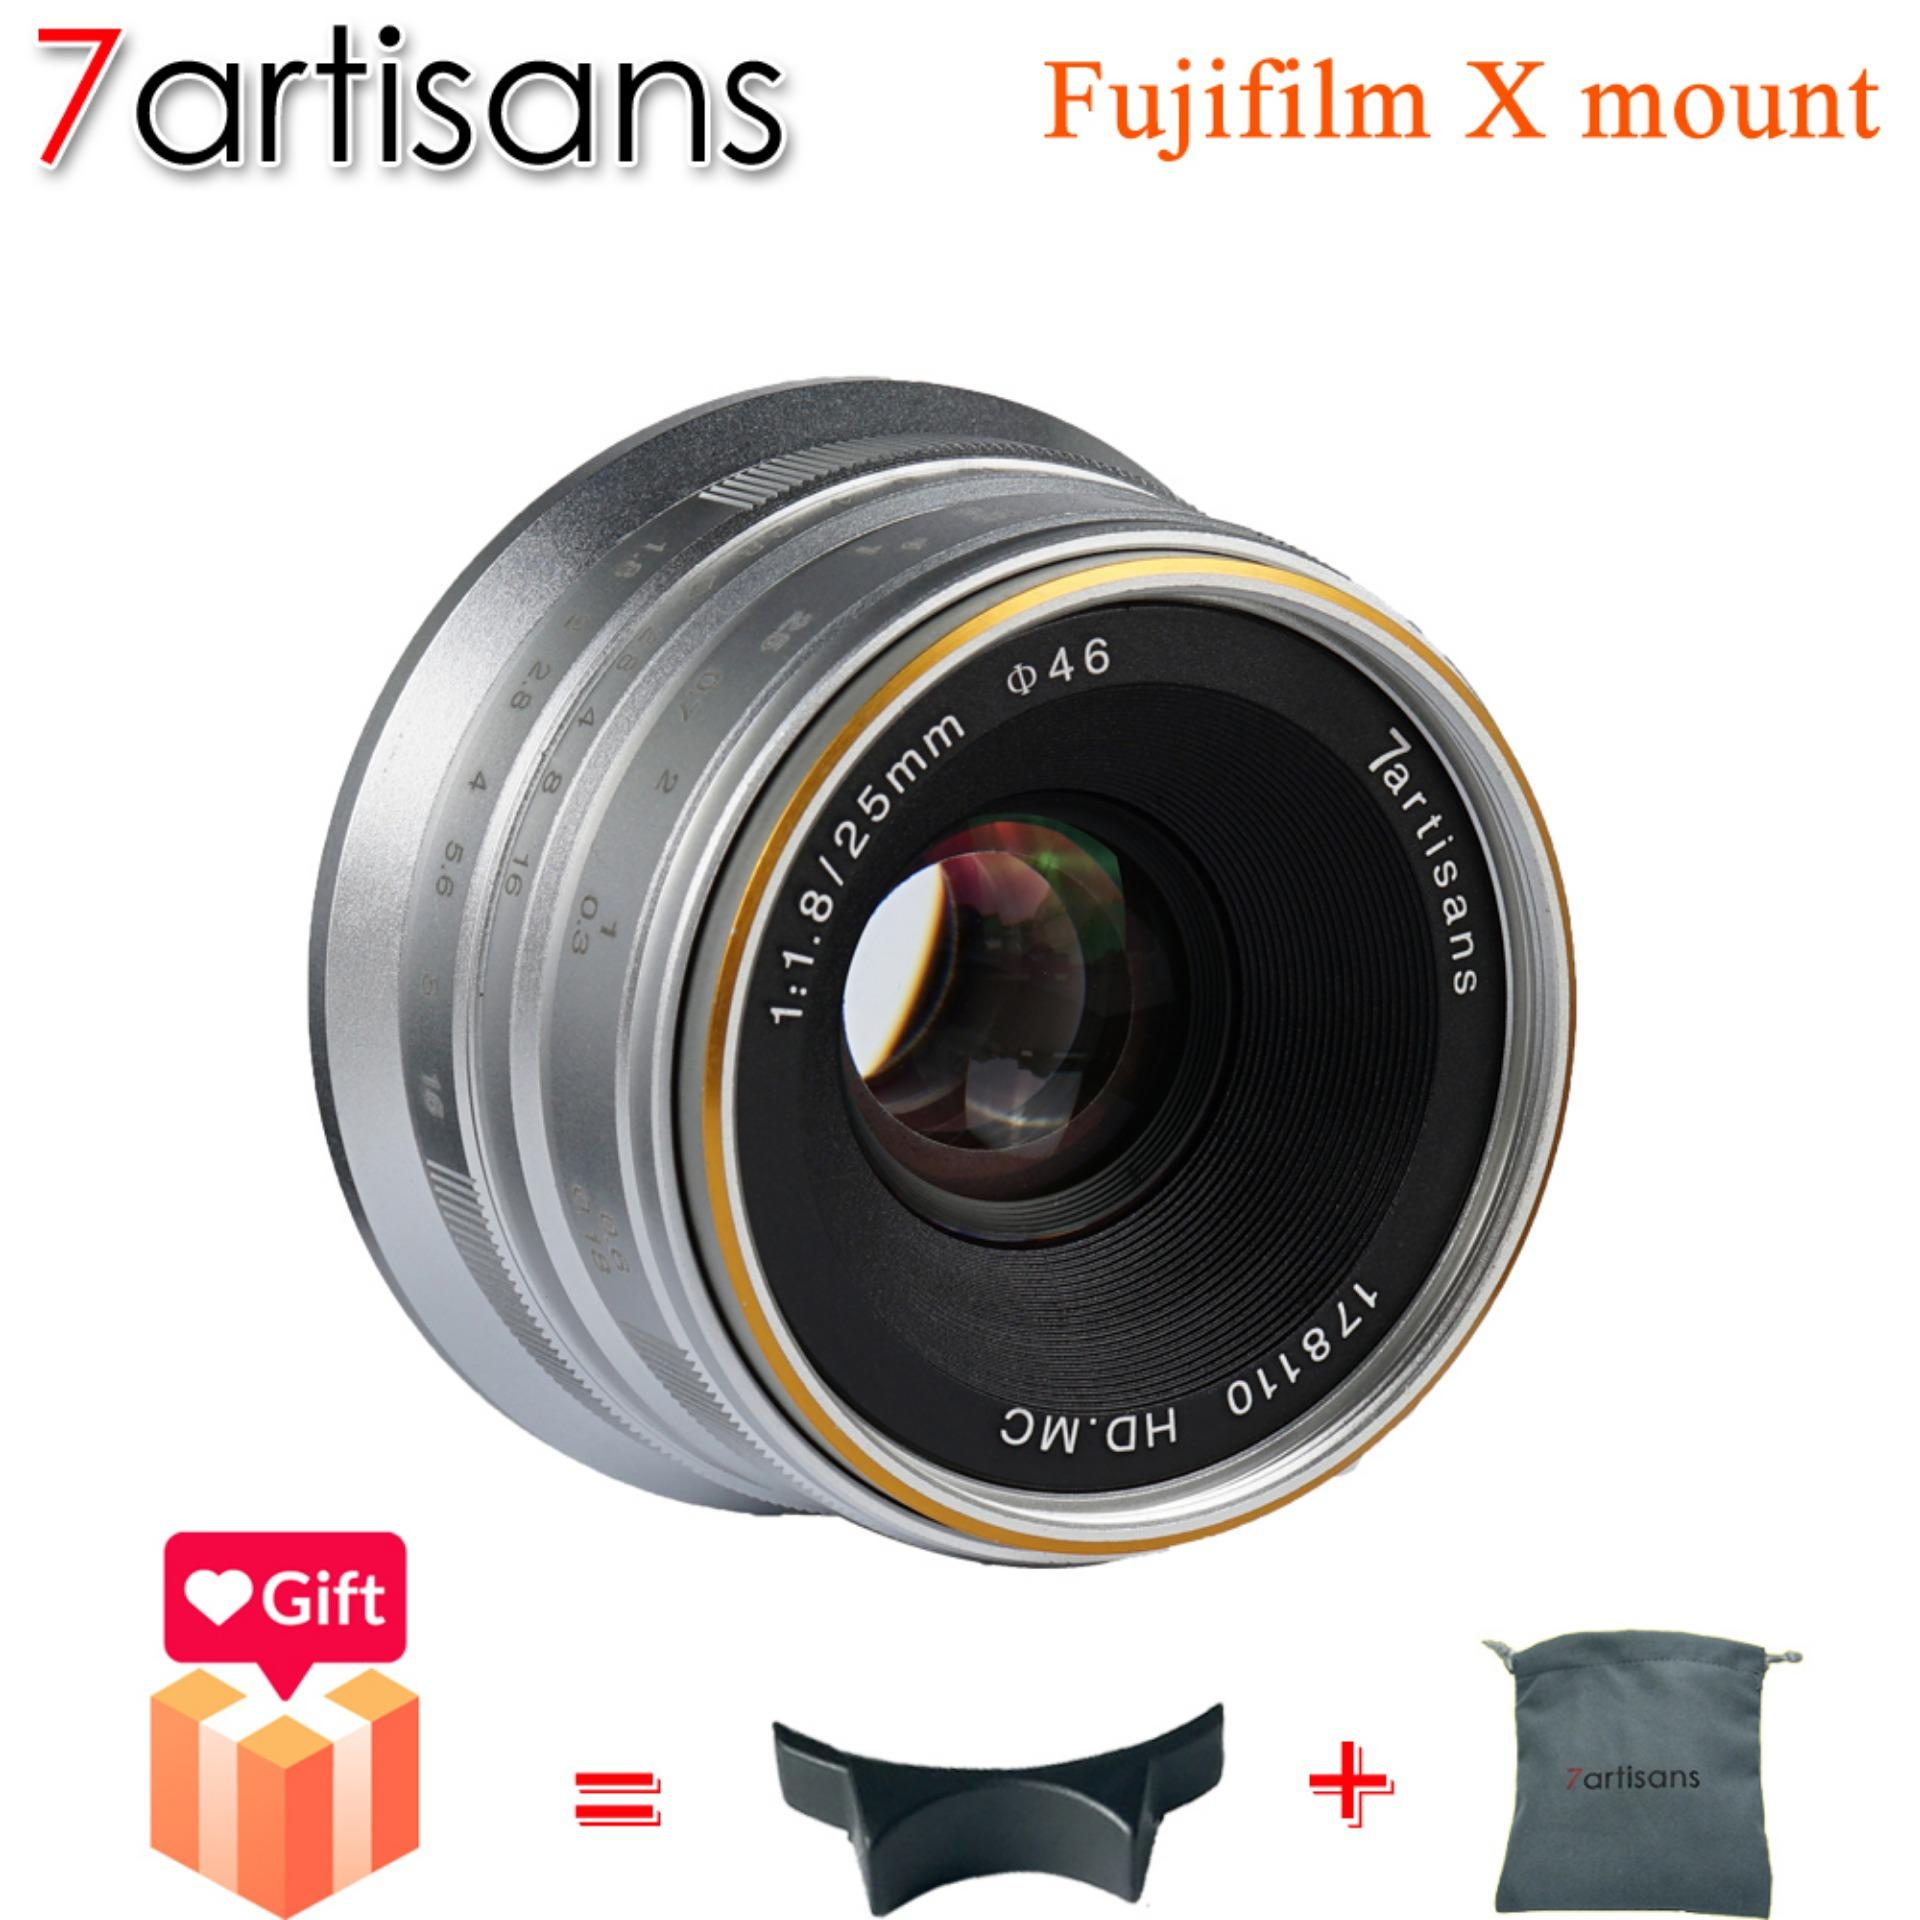 Buy Sell Cheapest M2x8mm Black Nylon Best Quality Product Deals Magnet Strip Flexible 15x2mm Sticker 3m Kulkas Kasa Nyamuk Kerajinan 7artisans 25mm F18 Fokus Manual Perdana Fixed Lensa Untuk Fujifilm Fuji Kamera X